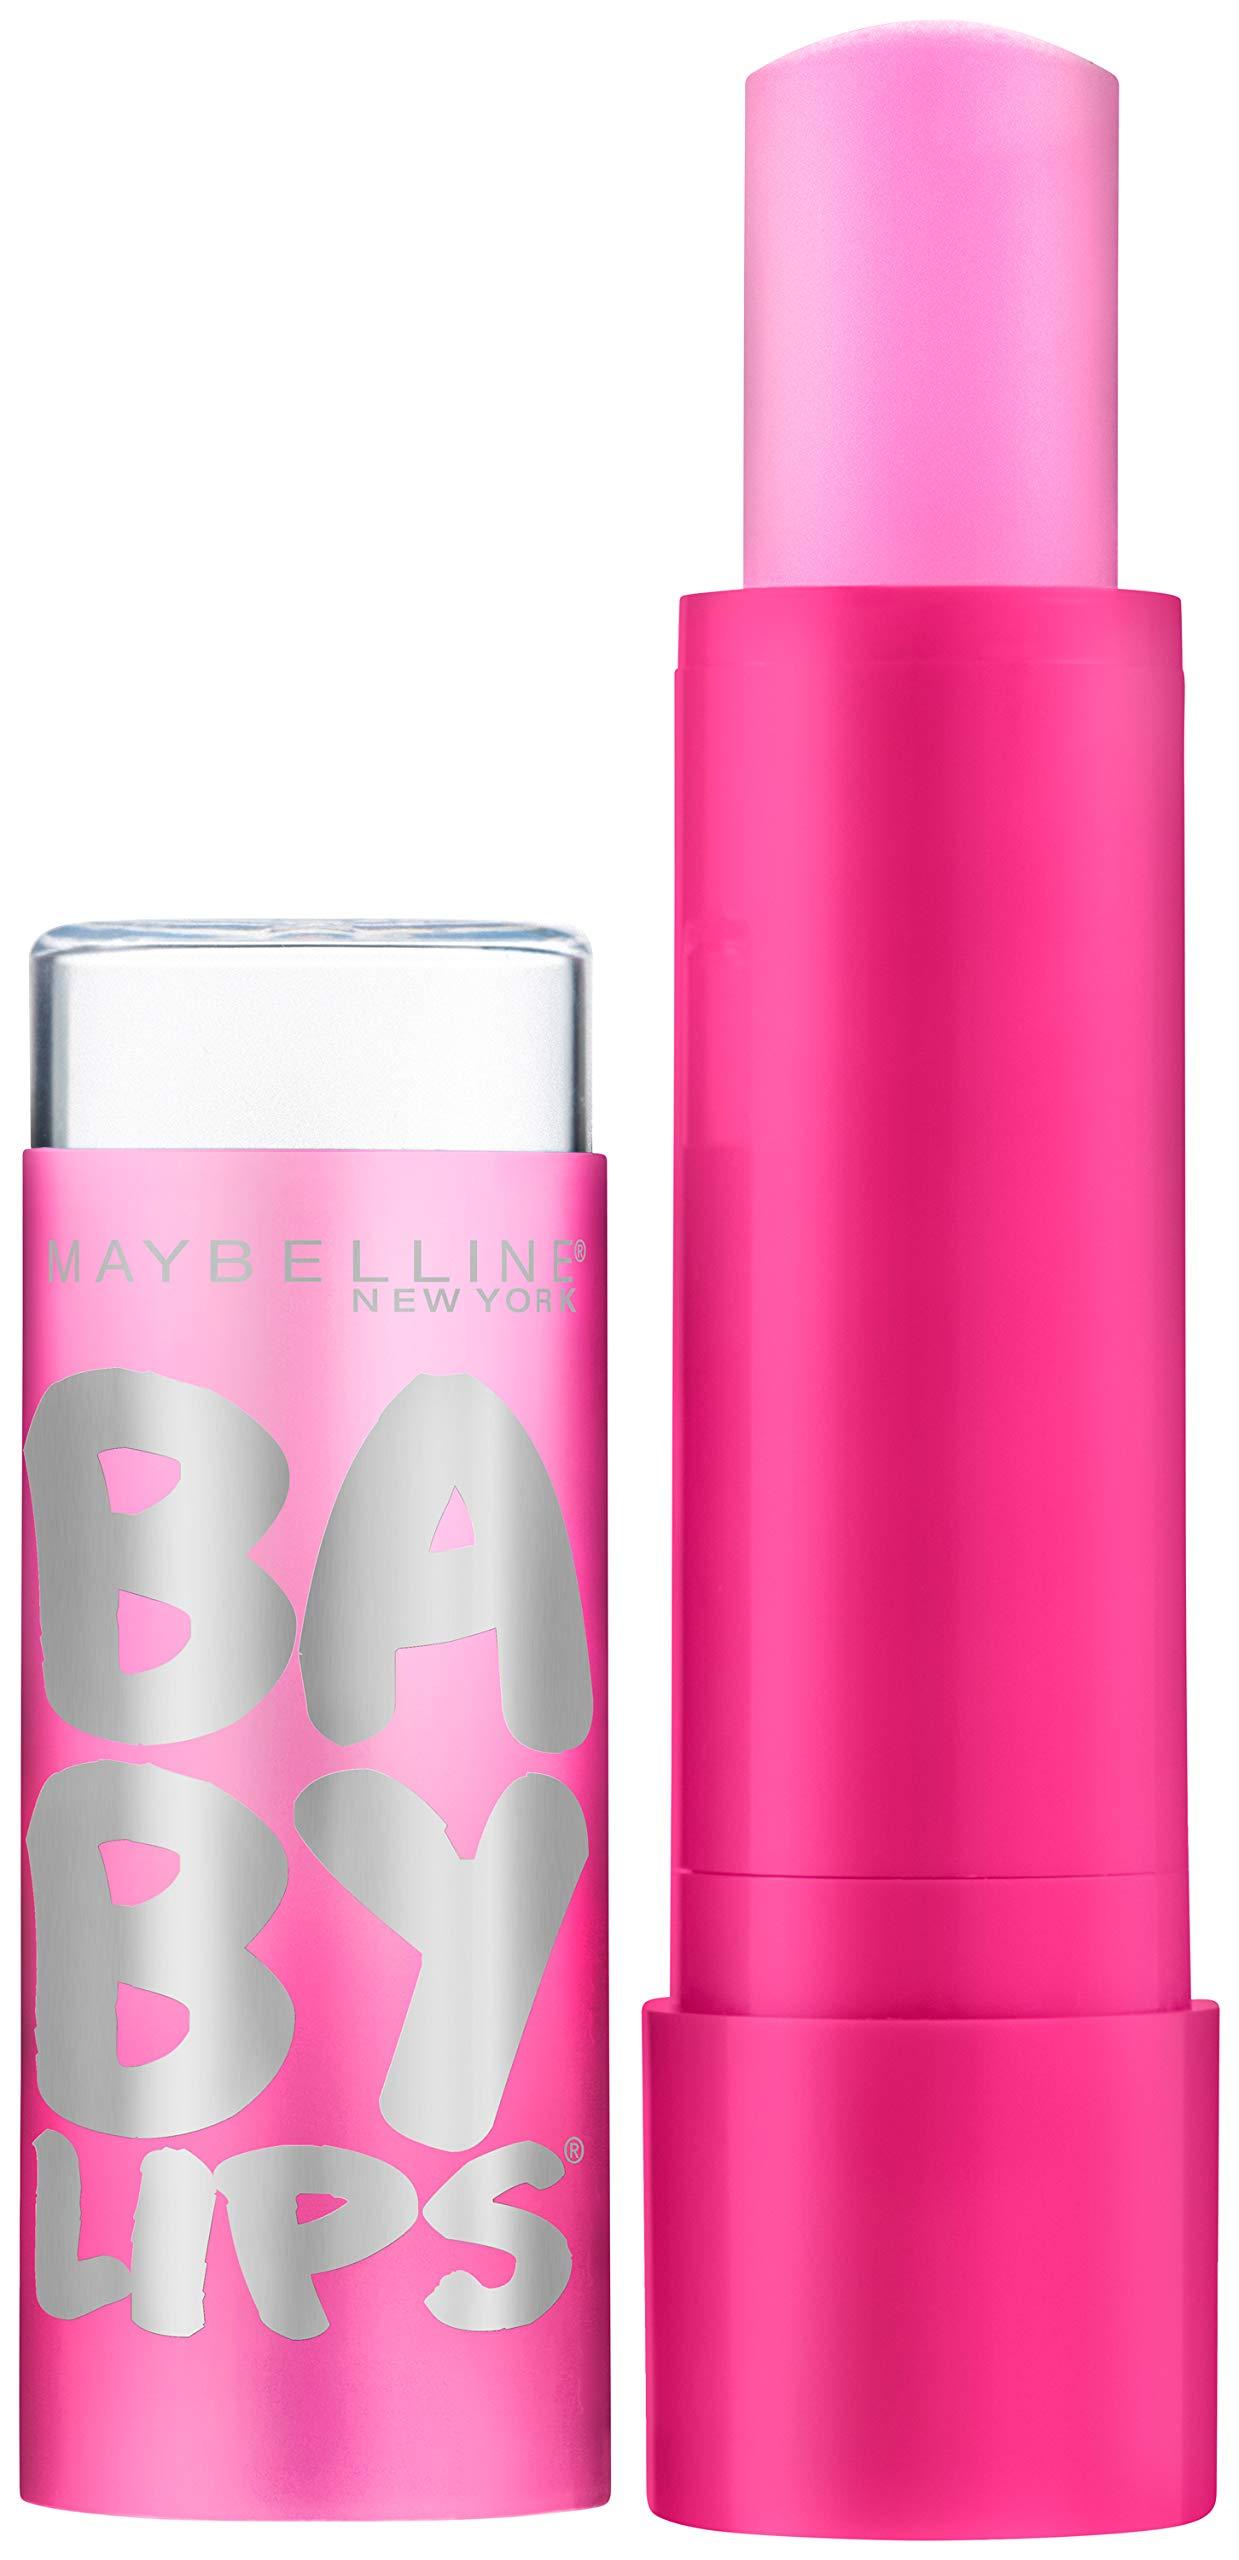 Maybelline New York Baby Lips Glow Lip Balm, My Pink, 0.13 oz.